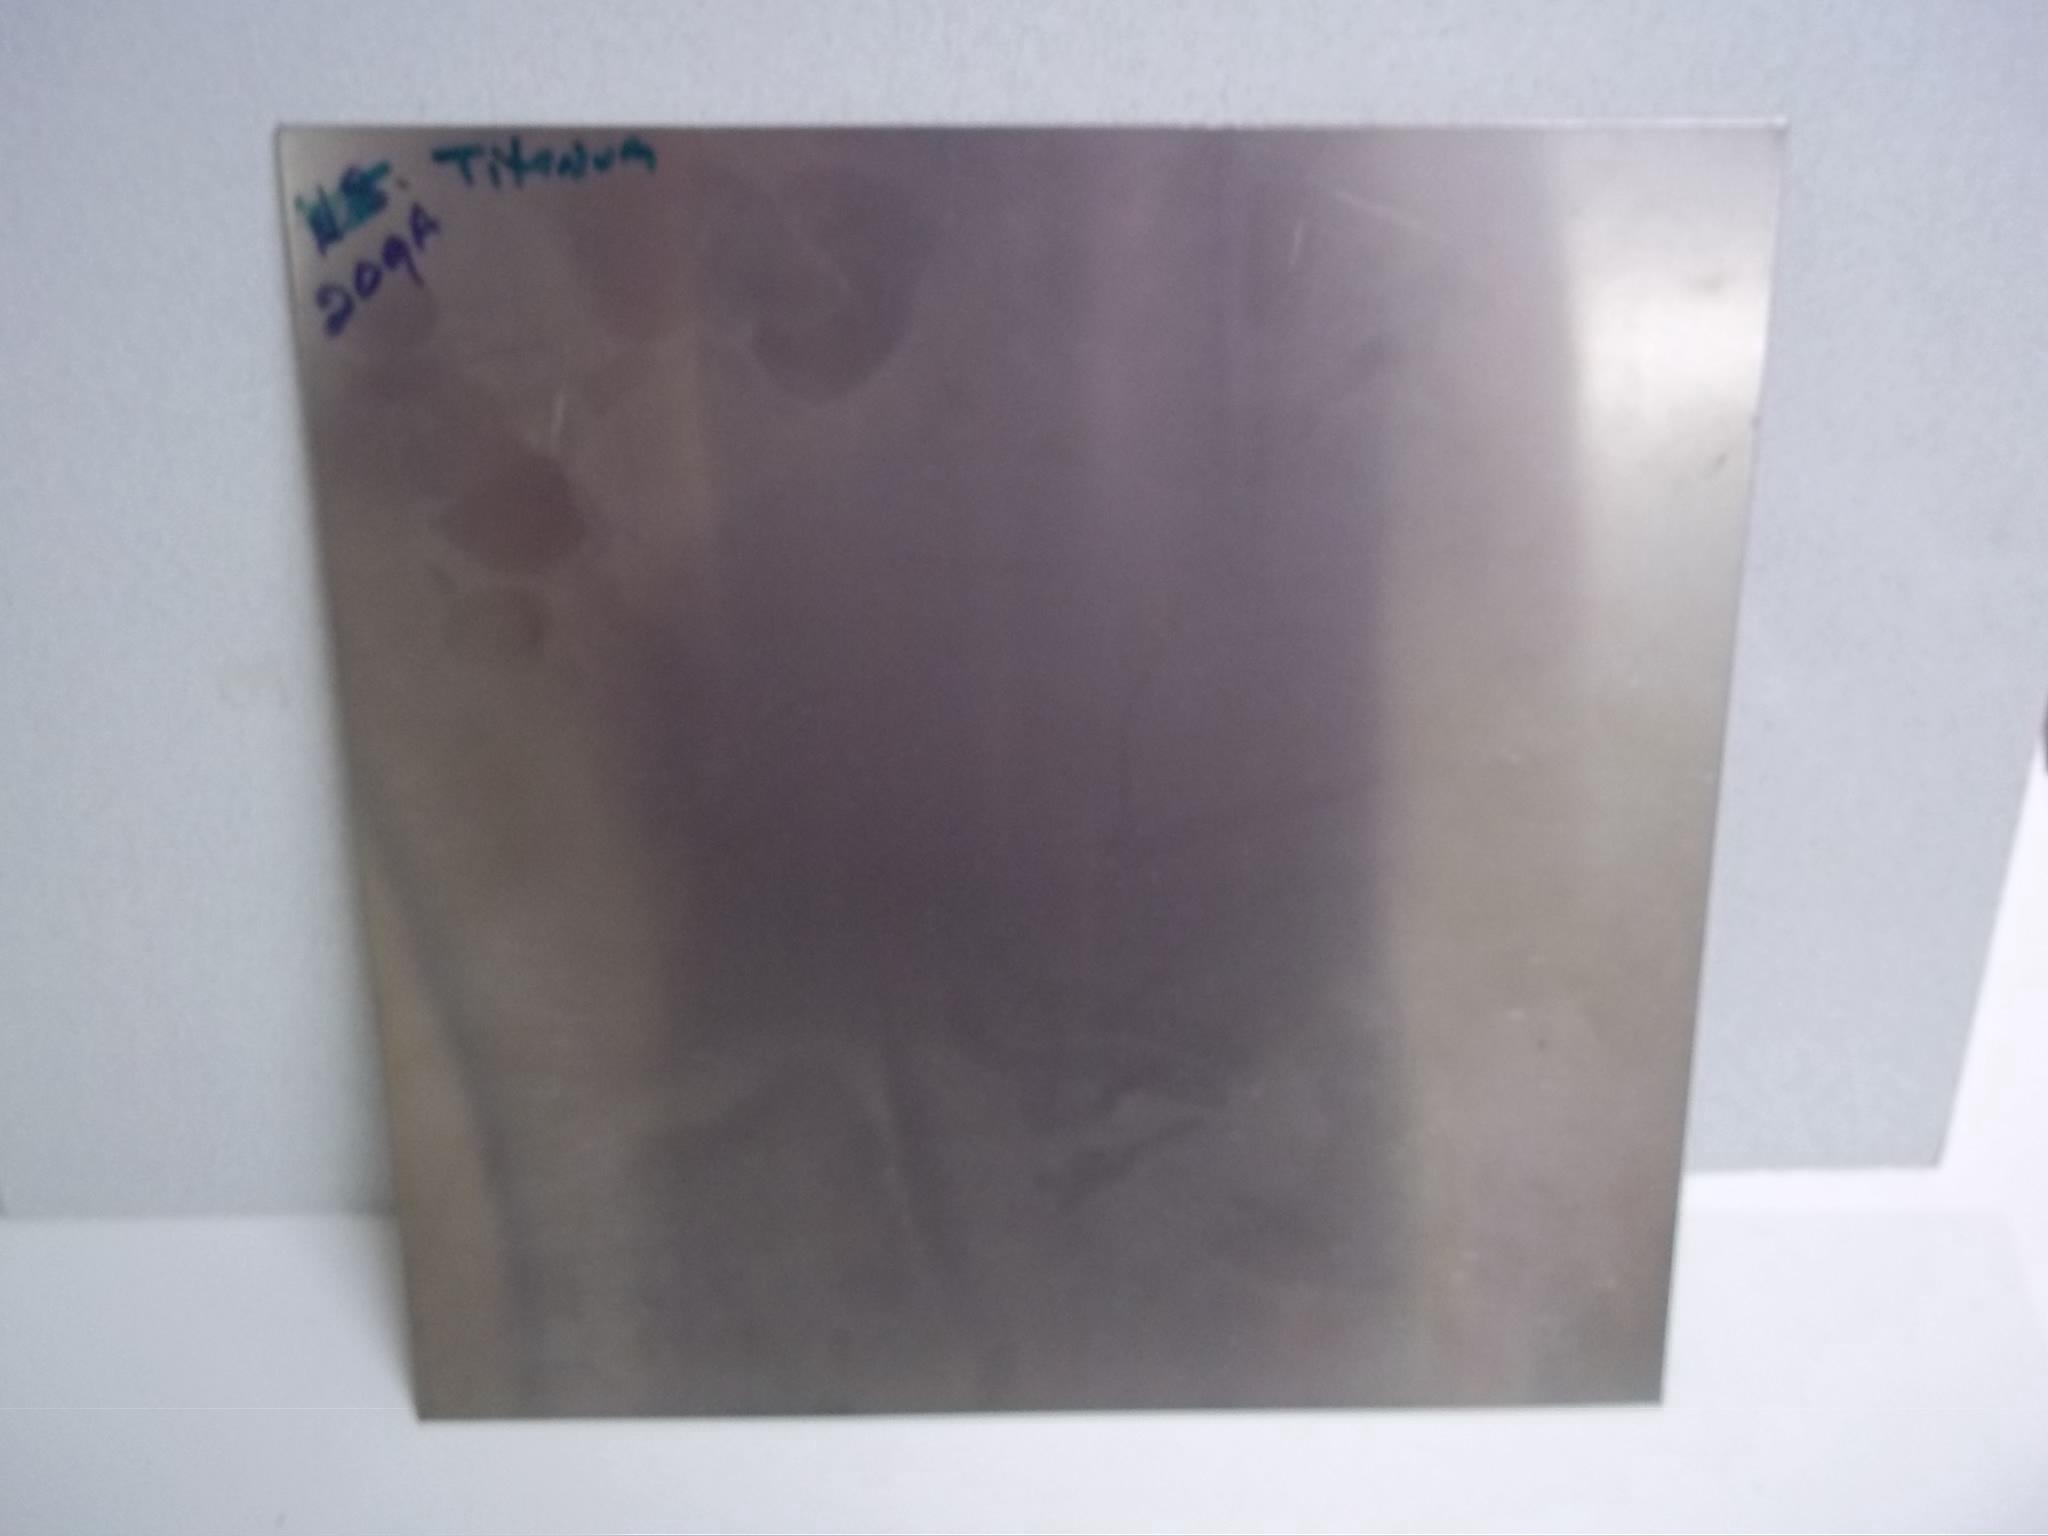 "ST20ga 20 Gauge Titanium 12"" x 12"" sheet Craft Metal"